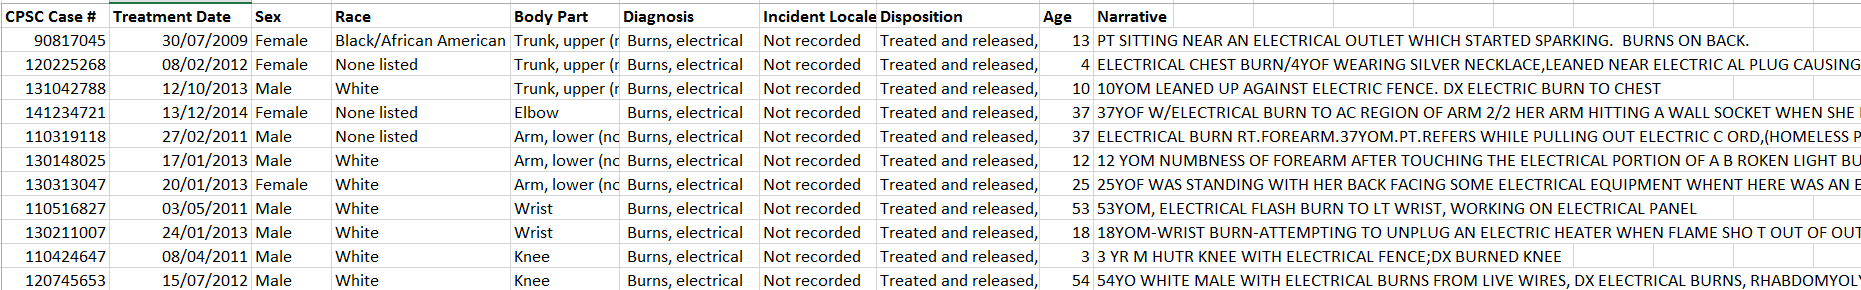 injury data